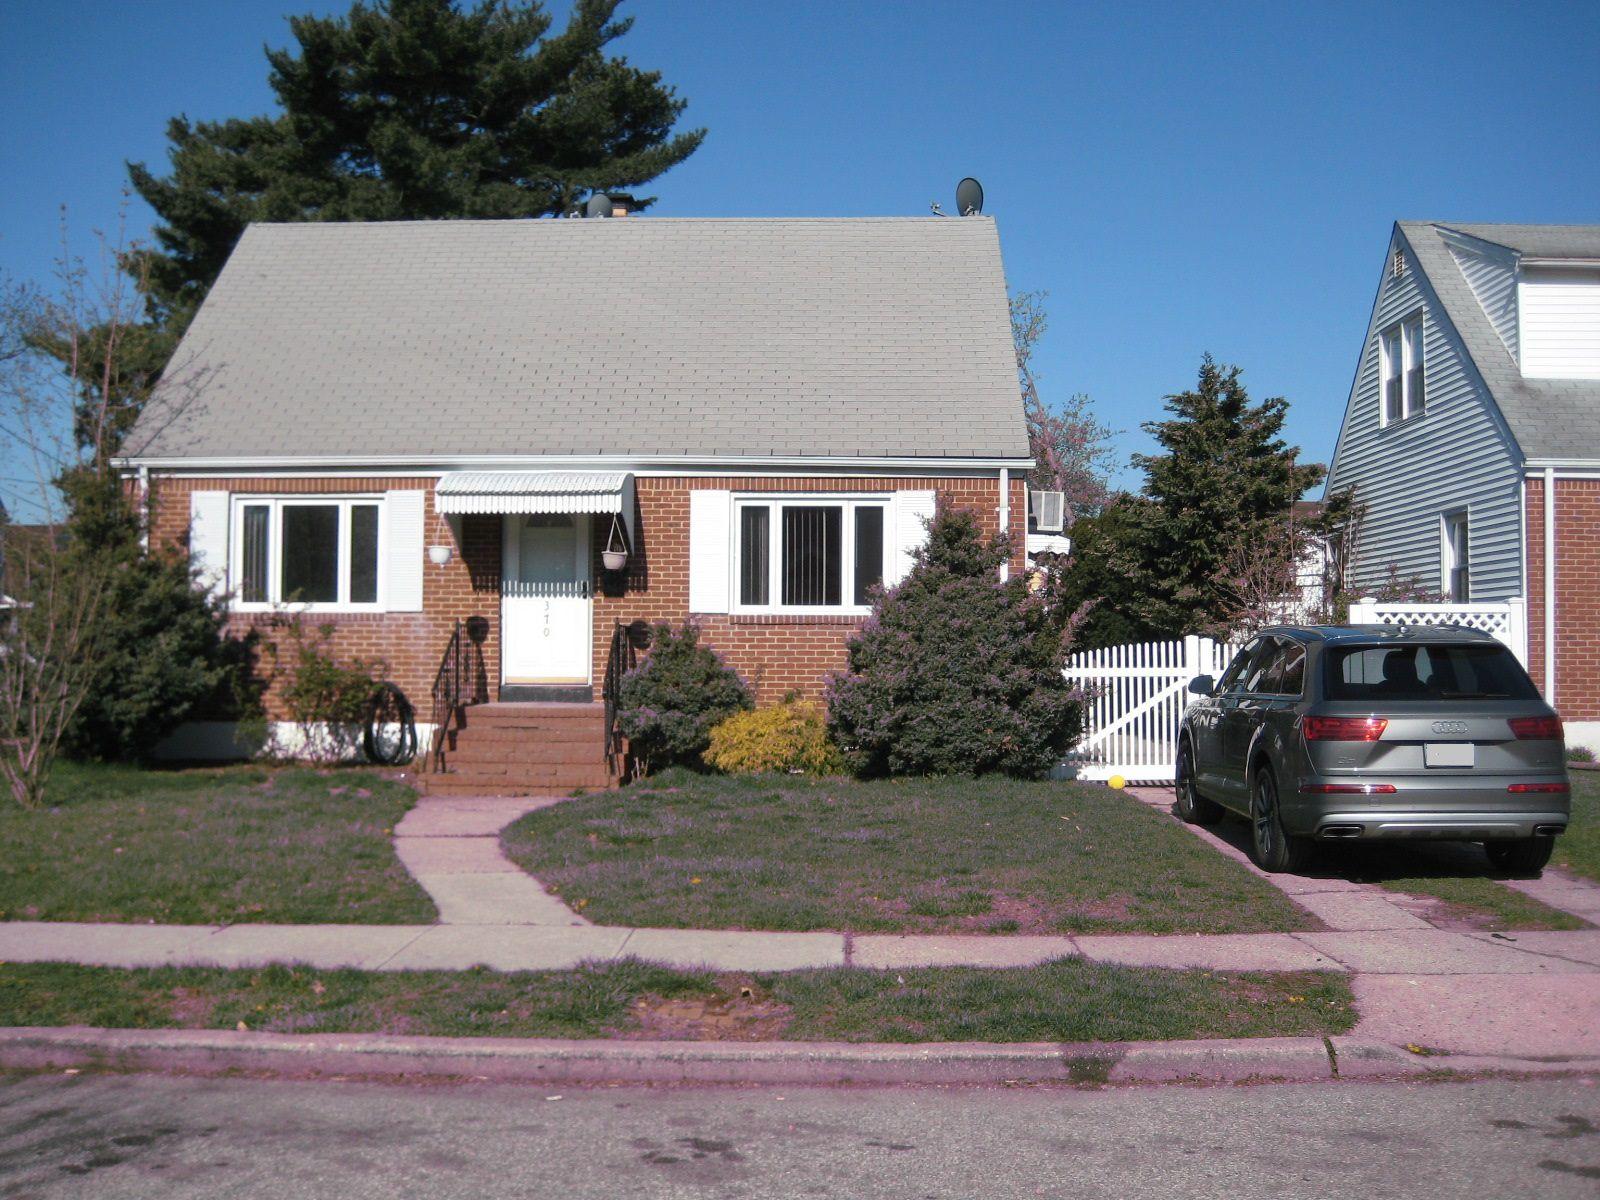 3700 2nd Pl, Uniondale, NY 11553 - 4 Bed, 2 Bath Single-Family Home - 29  Photos | Trulia